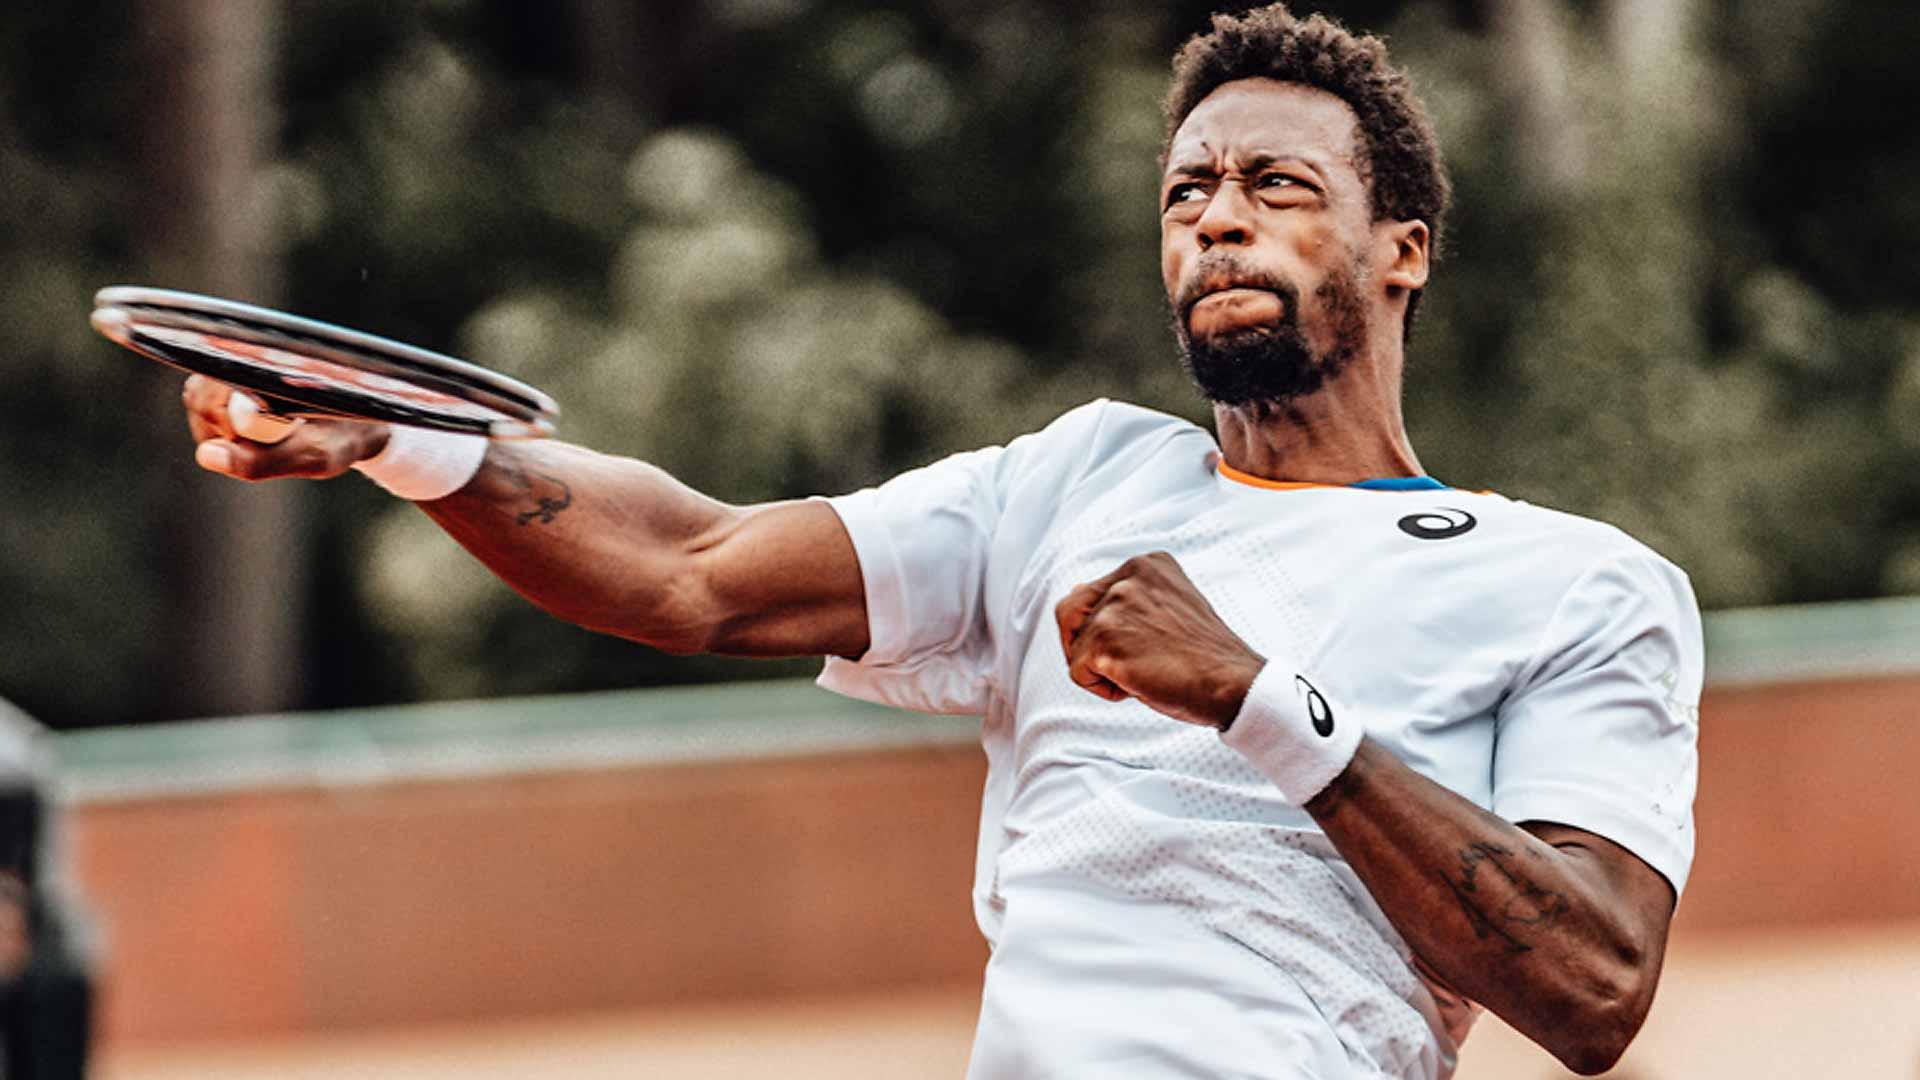 Lyon Open 2021: Gael Monfils vs. Yoshihito Nishioka Tennis Pick and Prediction